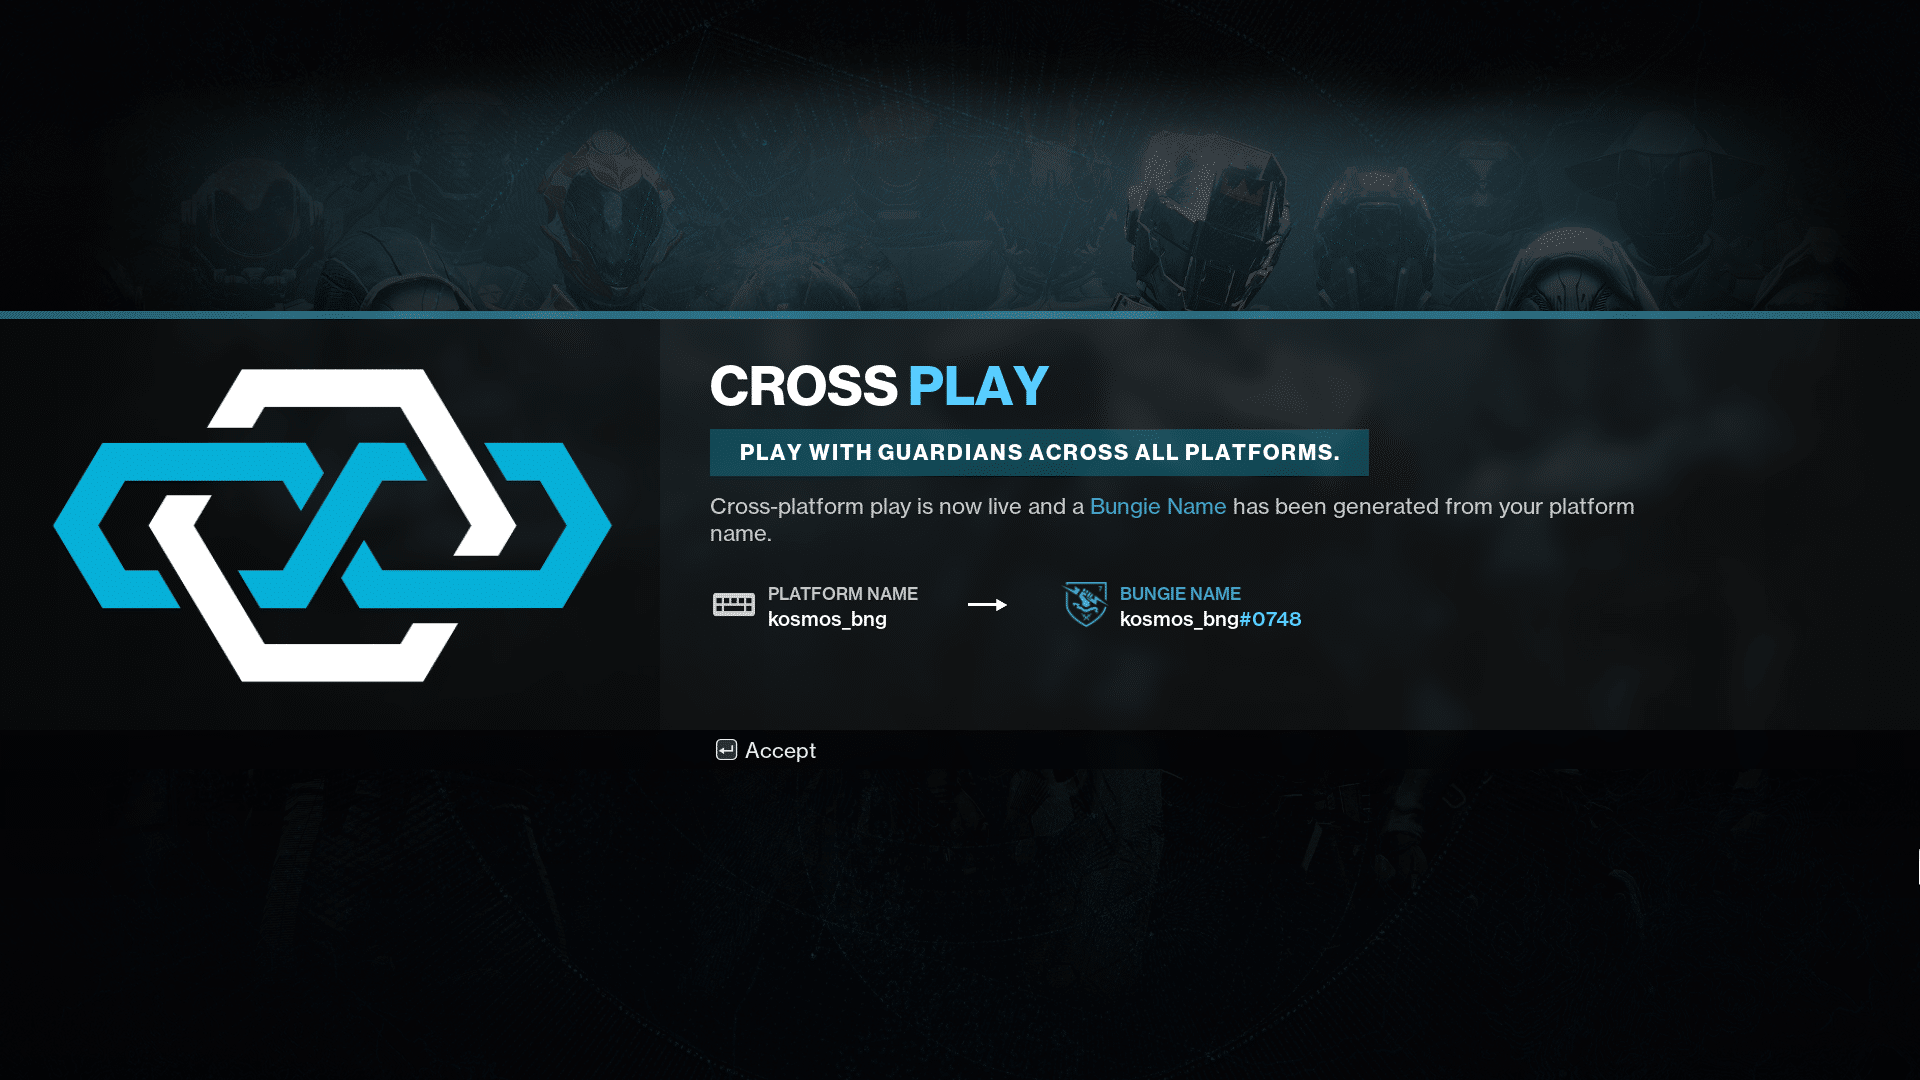 Destiny 2 Crossplay Overview